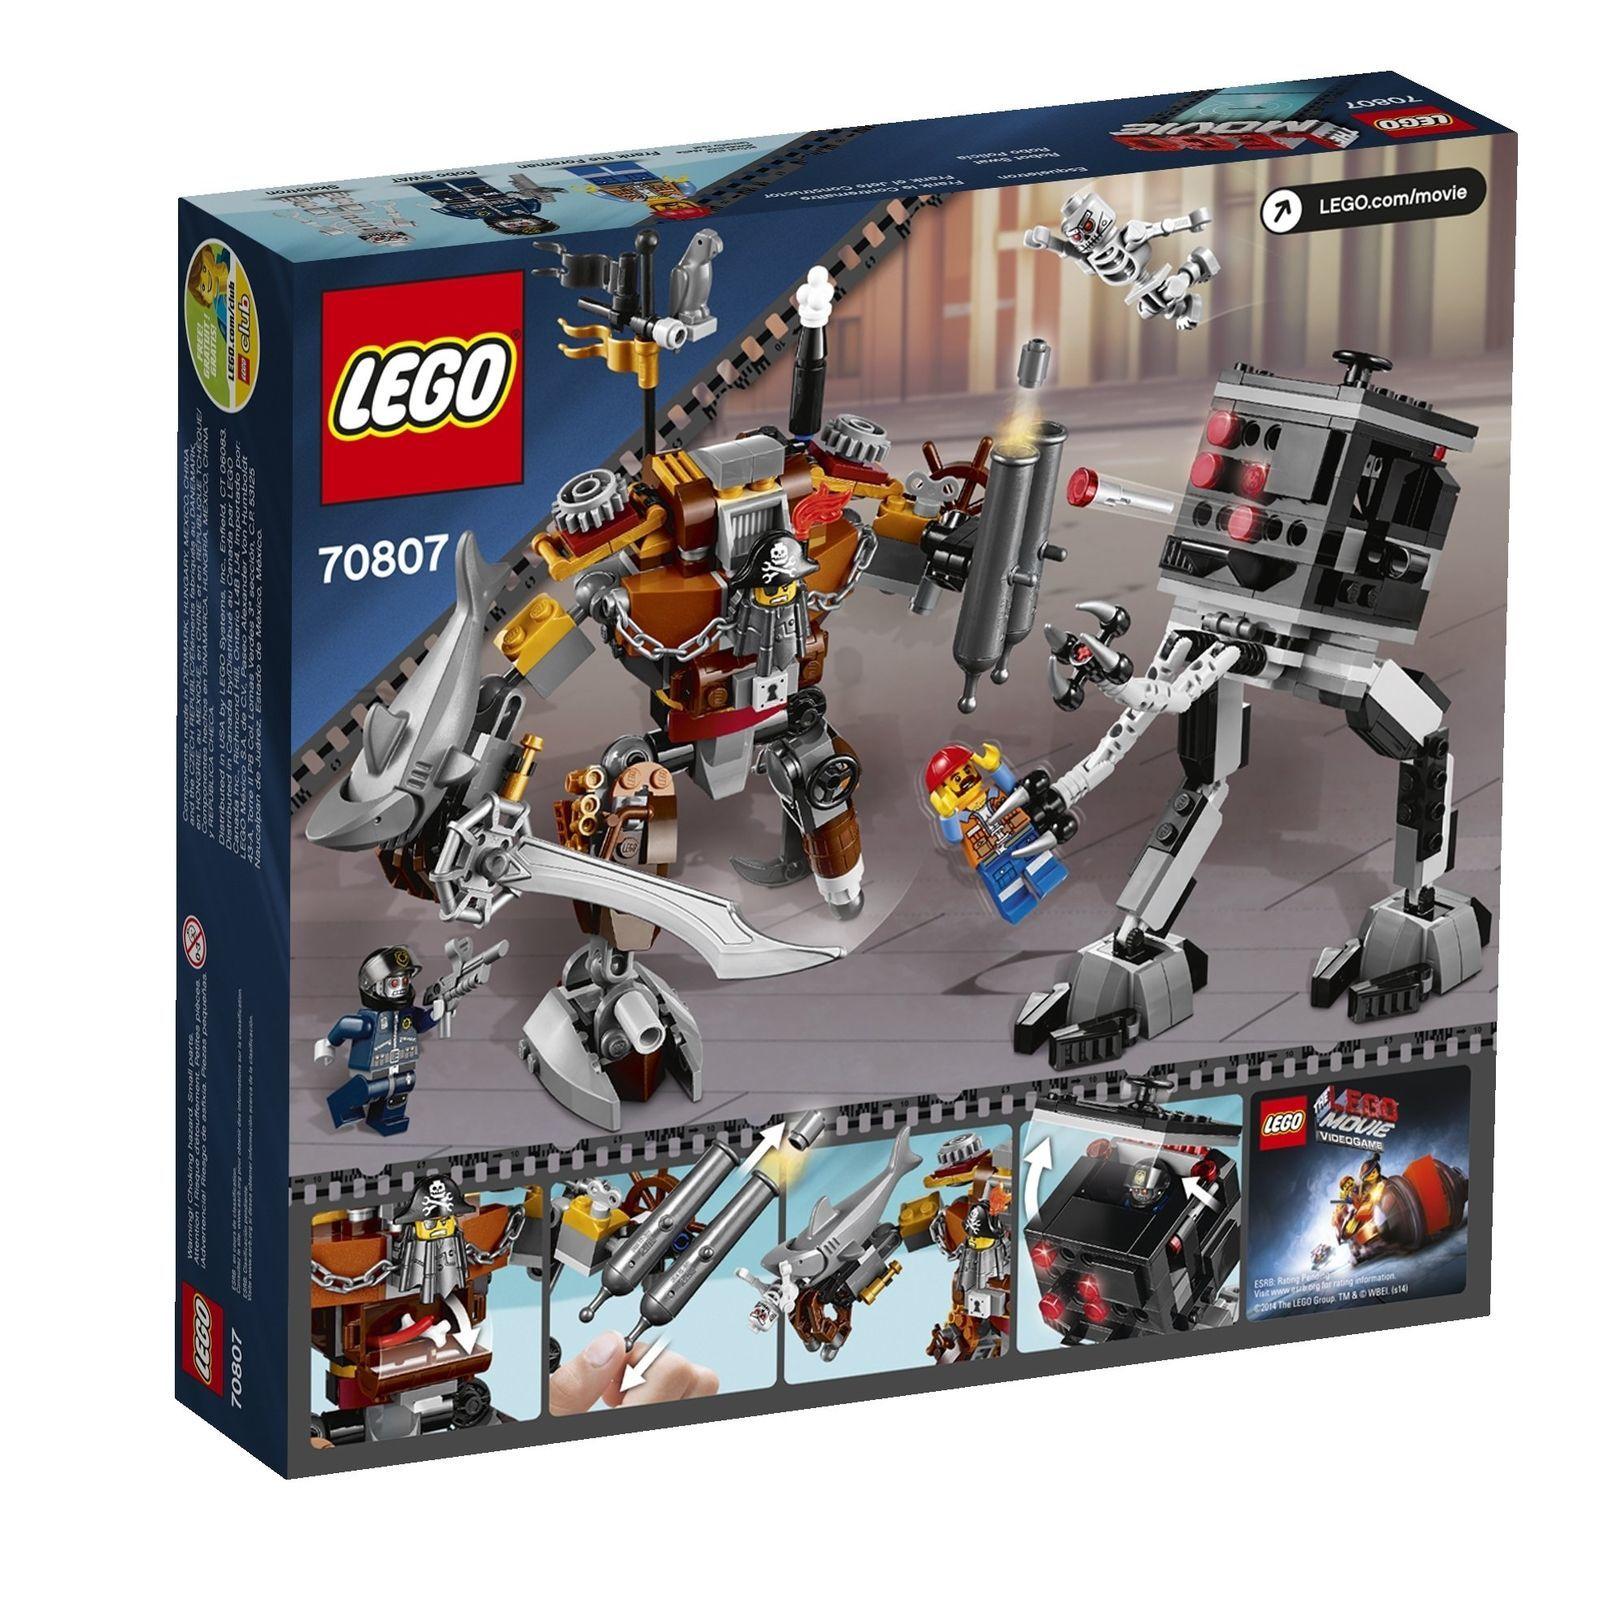 LEGO Movie 70807 MetalBeard's Duel [New] Building Toy Kit